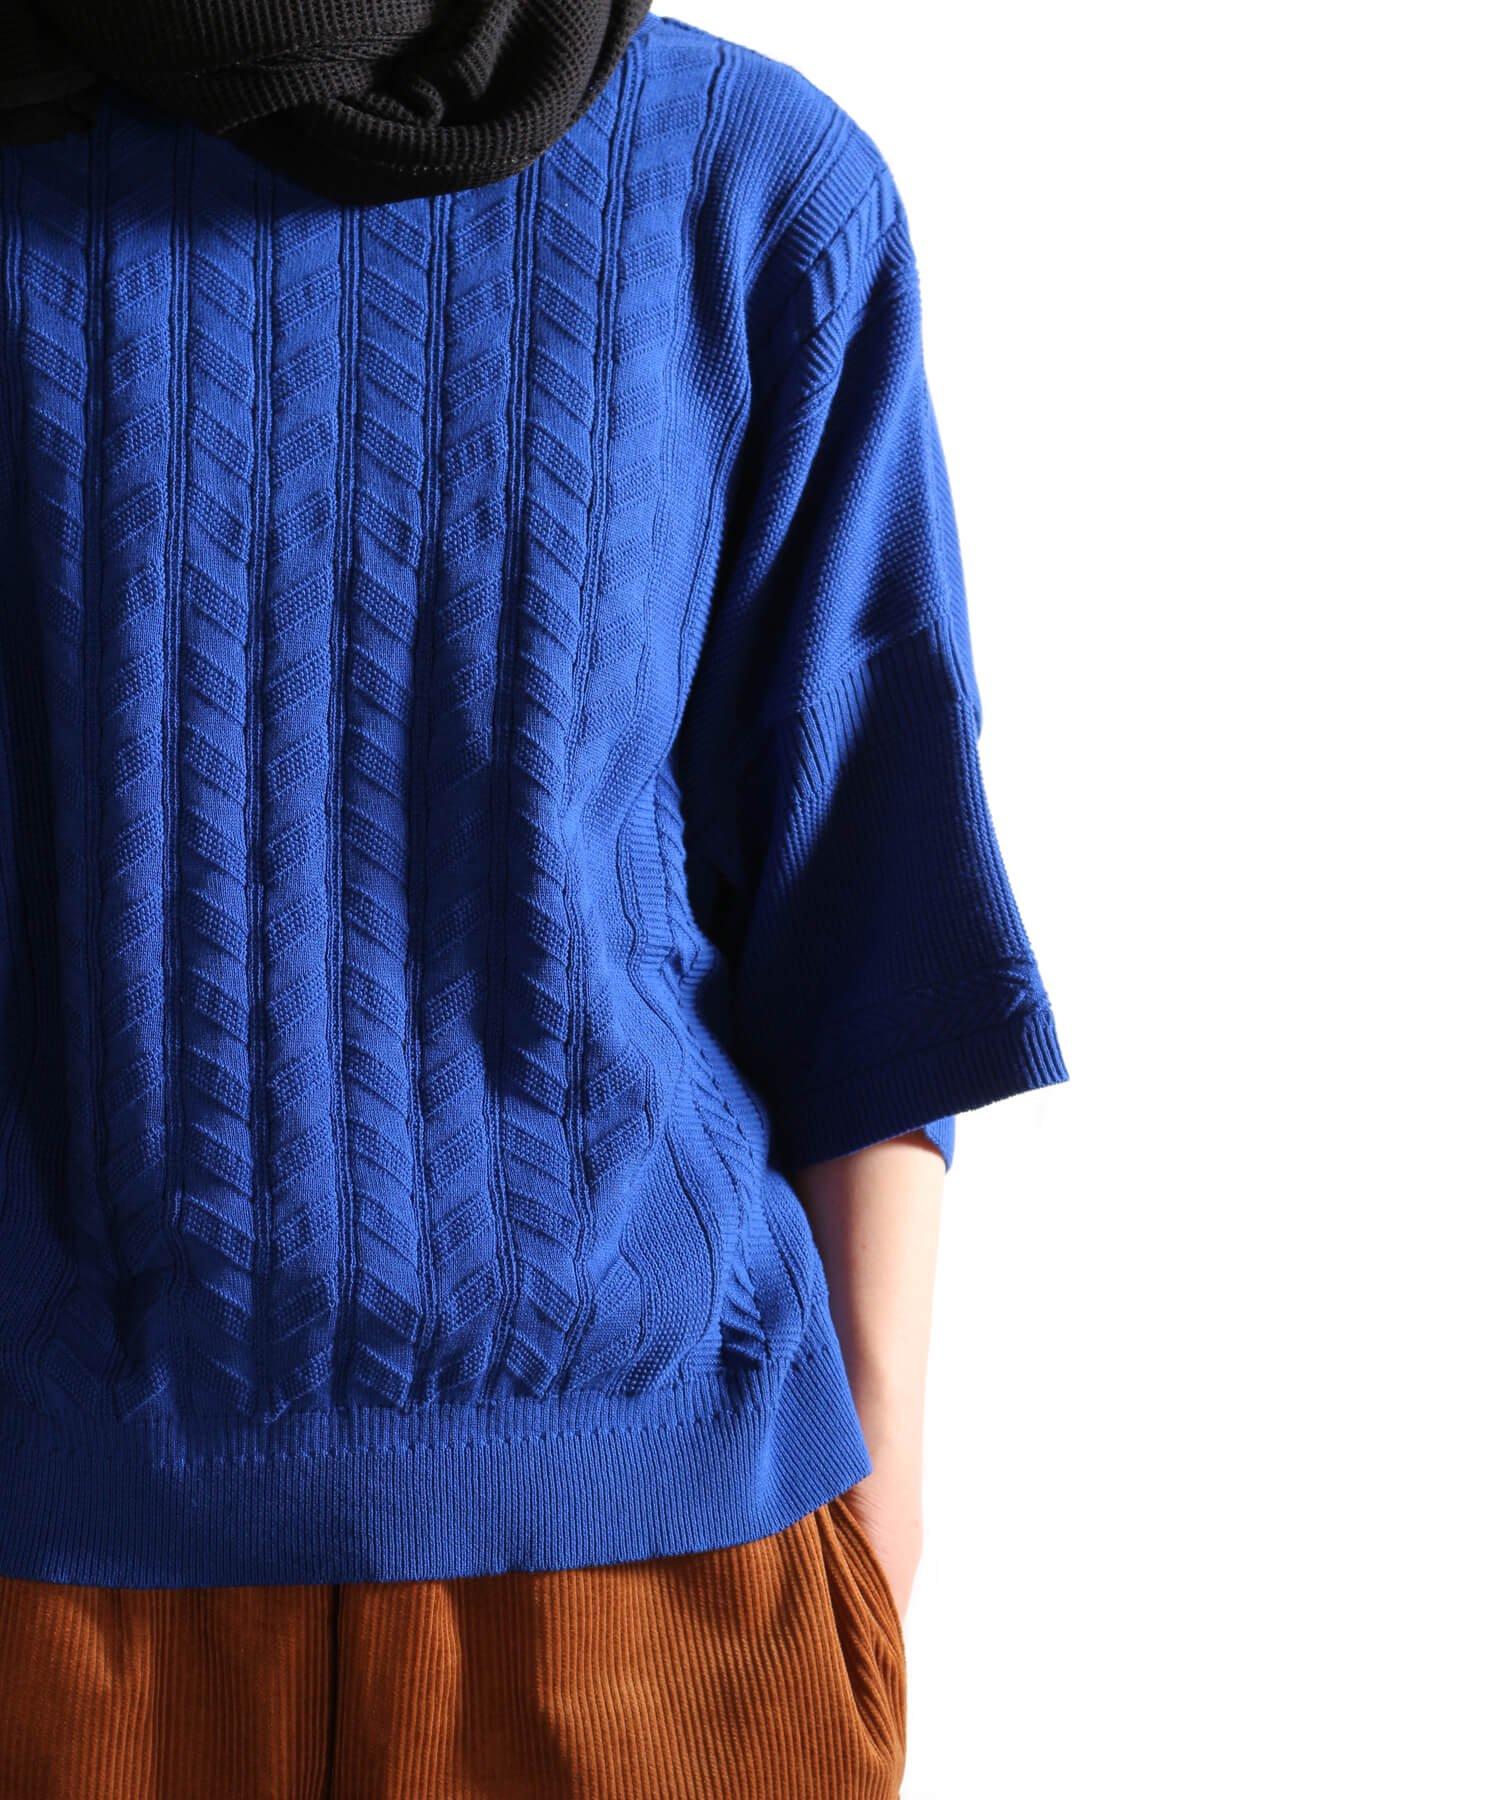 YASHIKI / ヤシキ |YASHIKI / ヤシキ × SIDEMILITIA inc. / サイドミリティア  RYUREI KNIT (LIMITED BLUE/WOMEN'S) 商品画像15